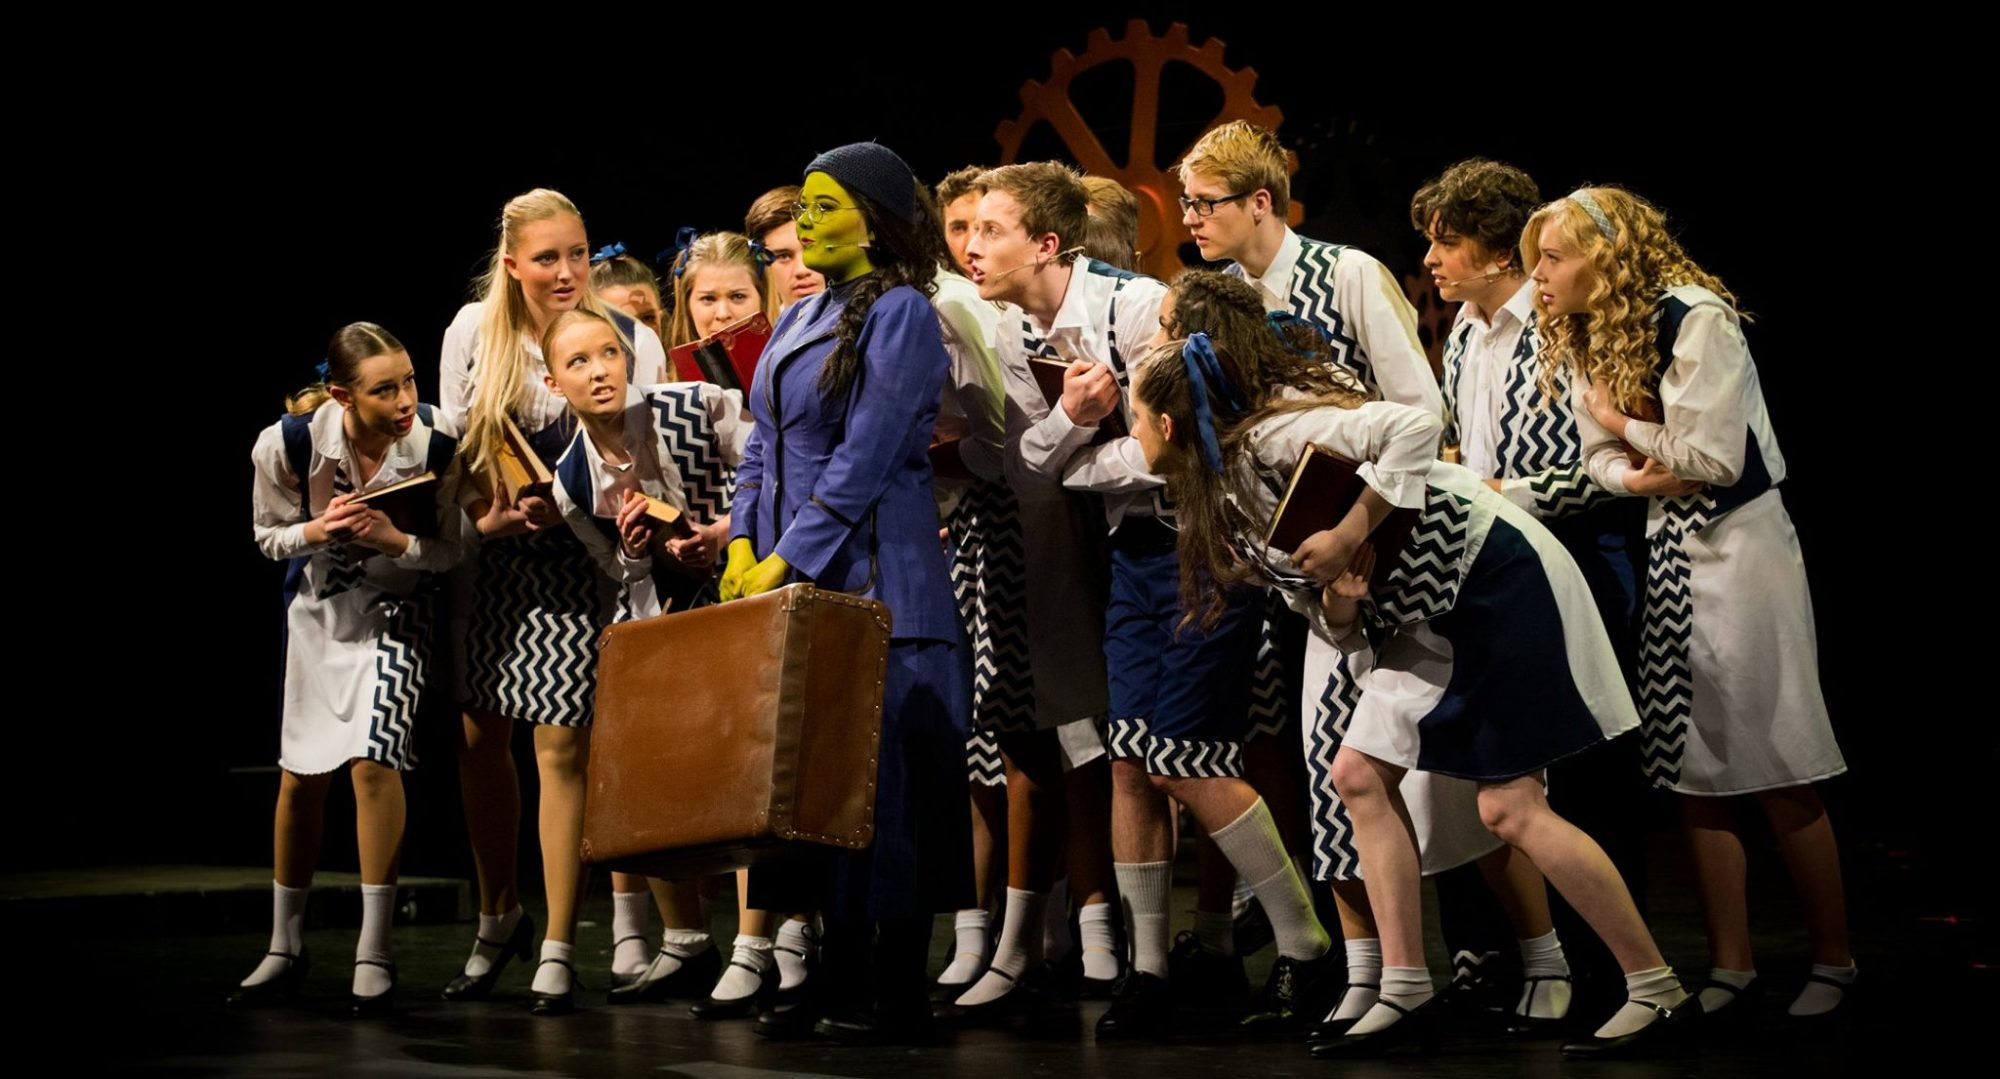 Albatross Musical Theatre Company